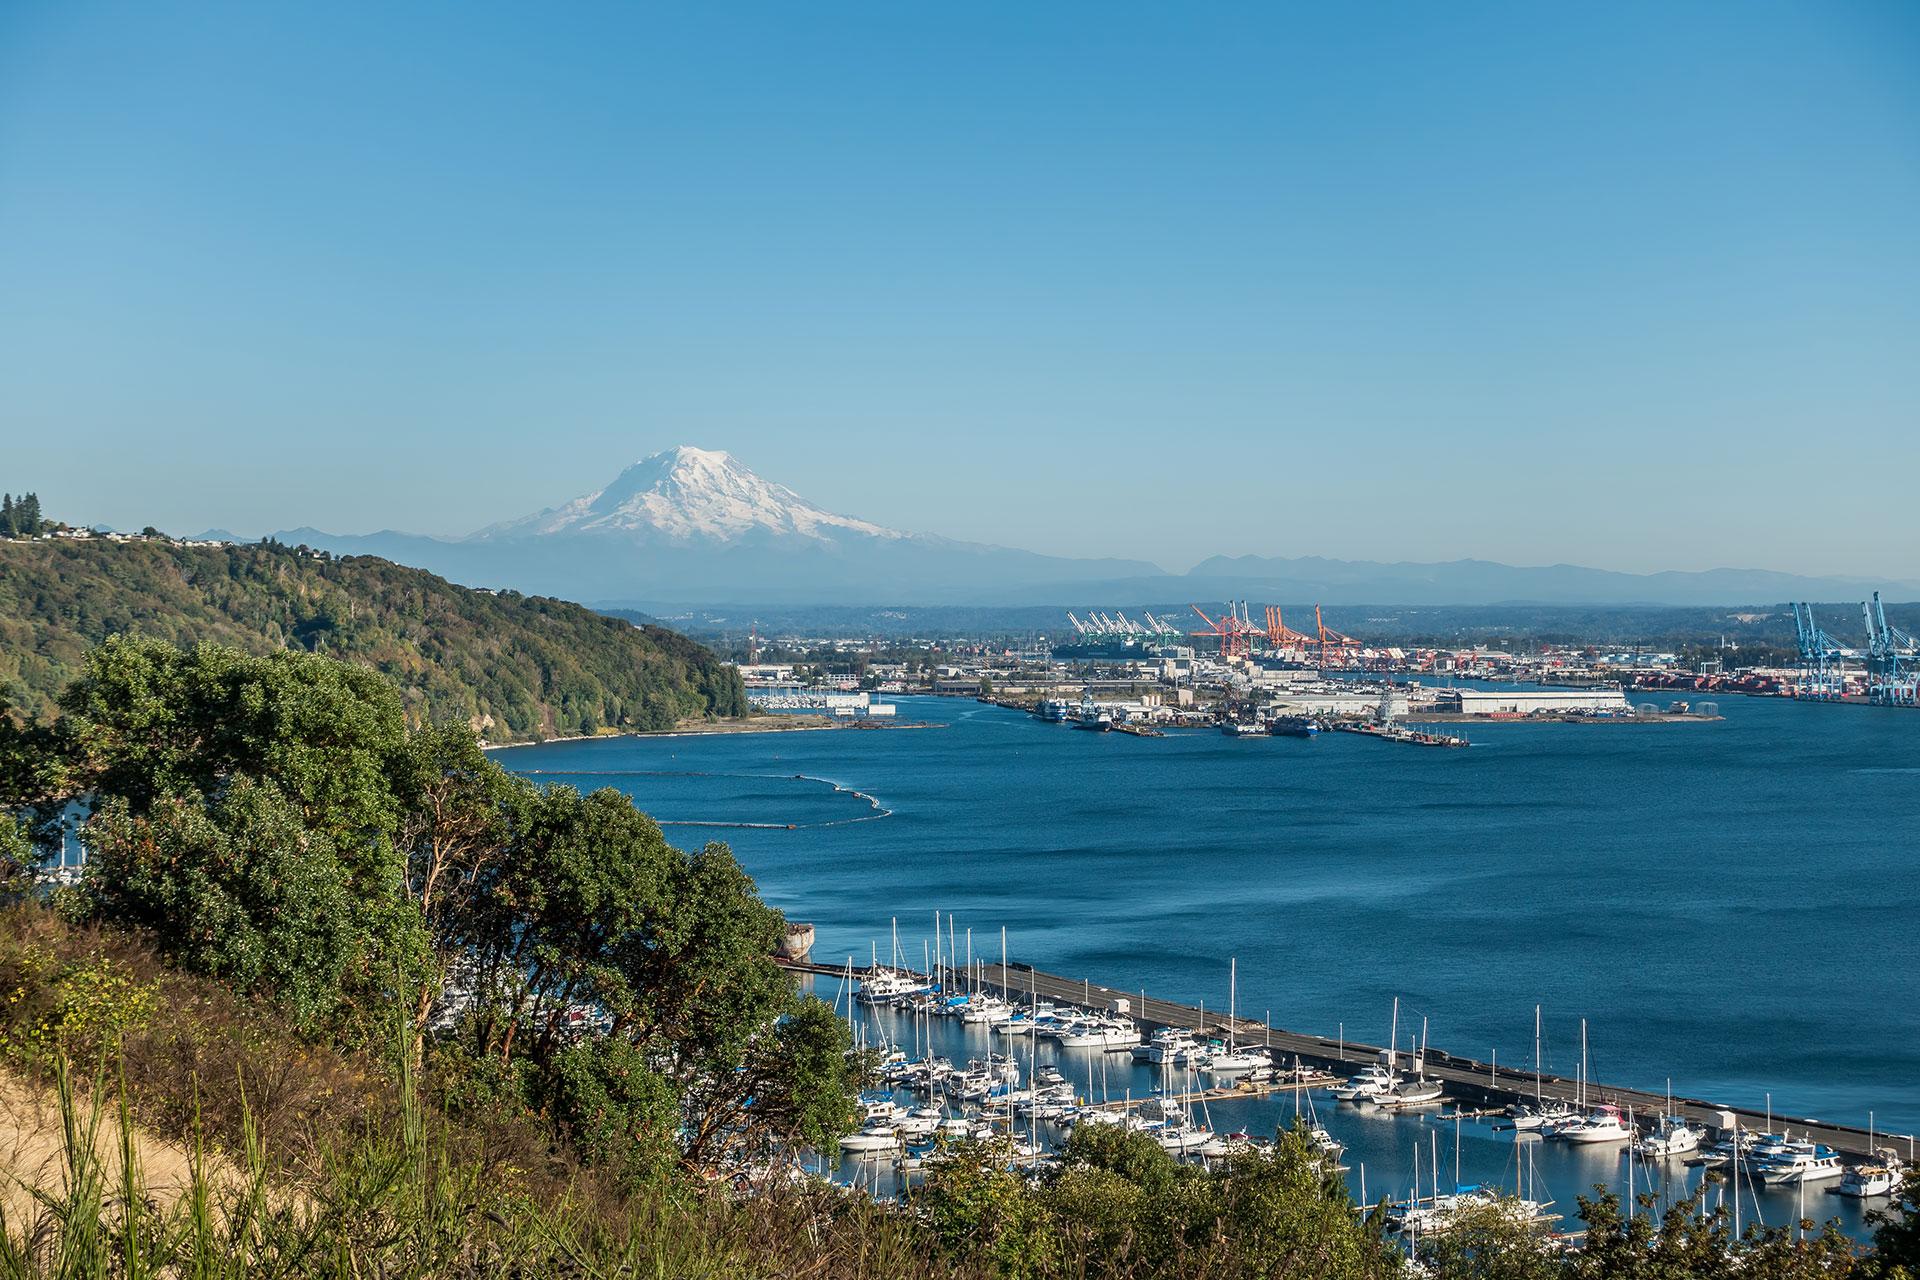 Tacoma Washington; Courtesy of George Cole Photo/Shutterstock.com